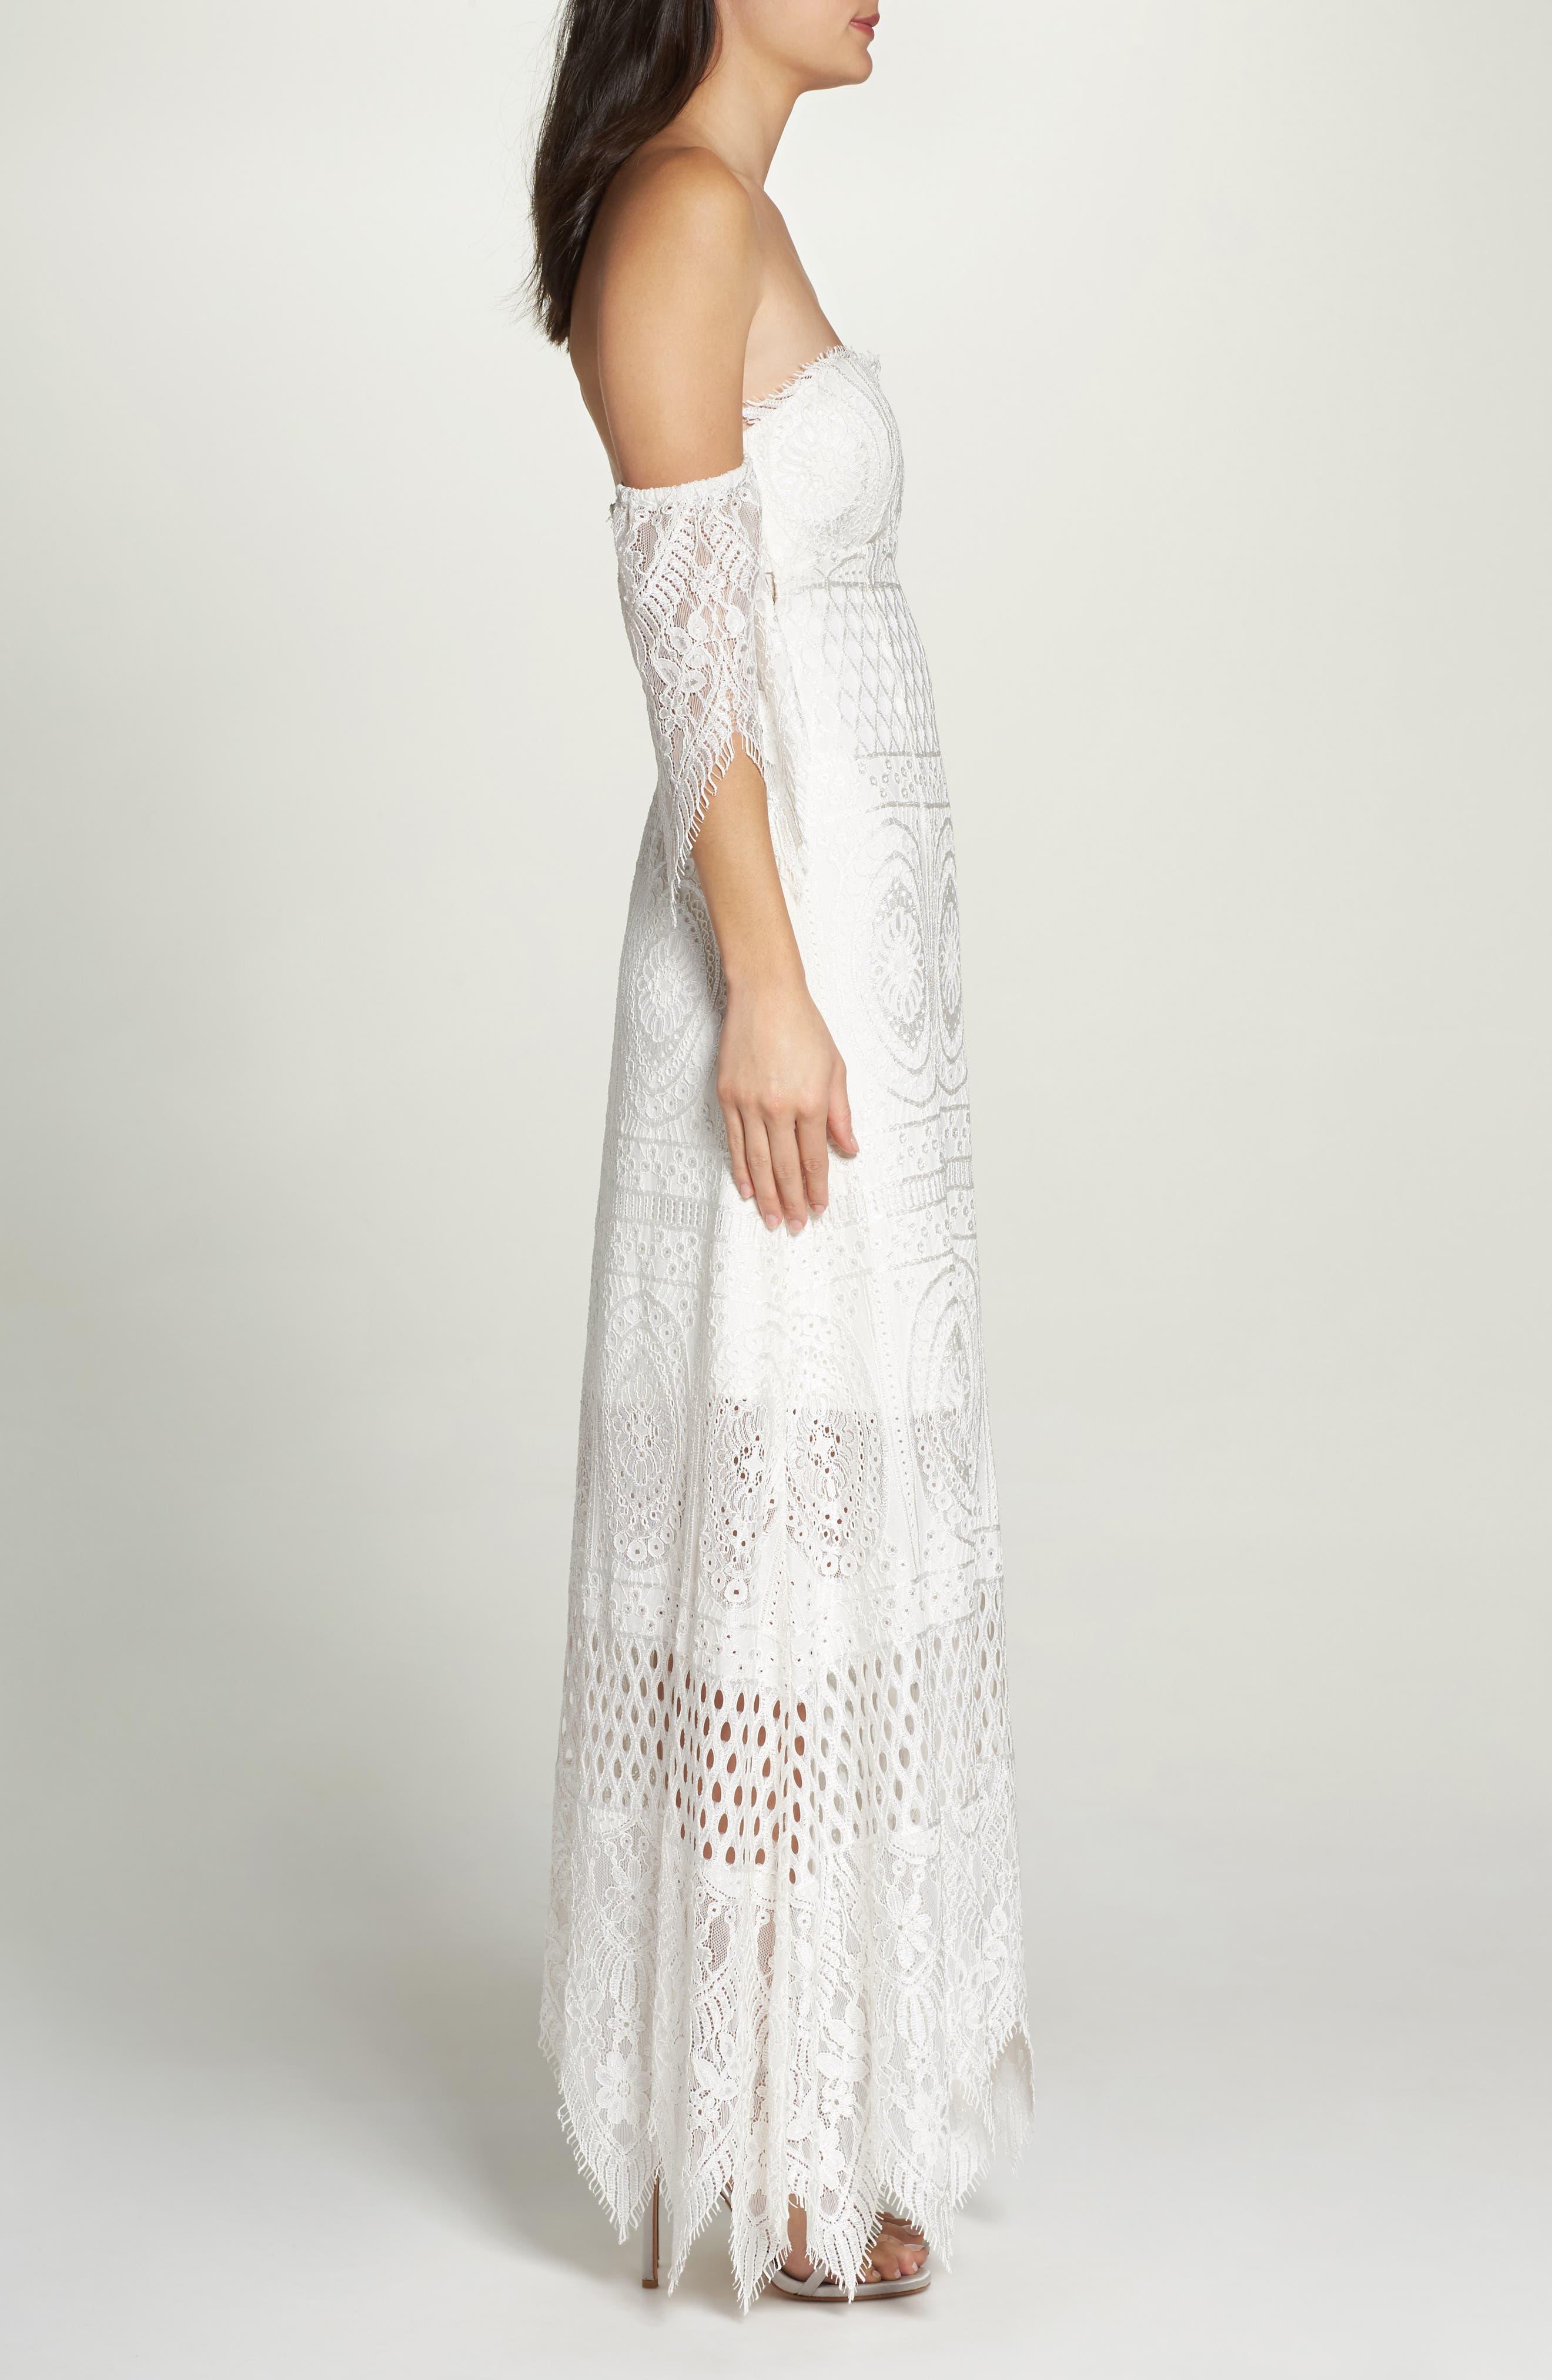 Lace Off the Shoulder Maxi Dress,                             Alternate thumbnail 3, color,                             900